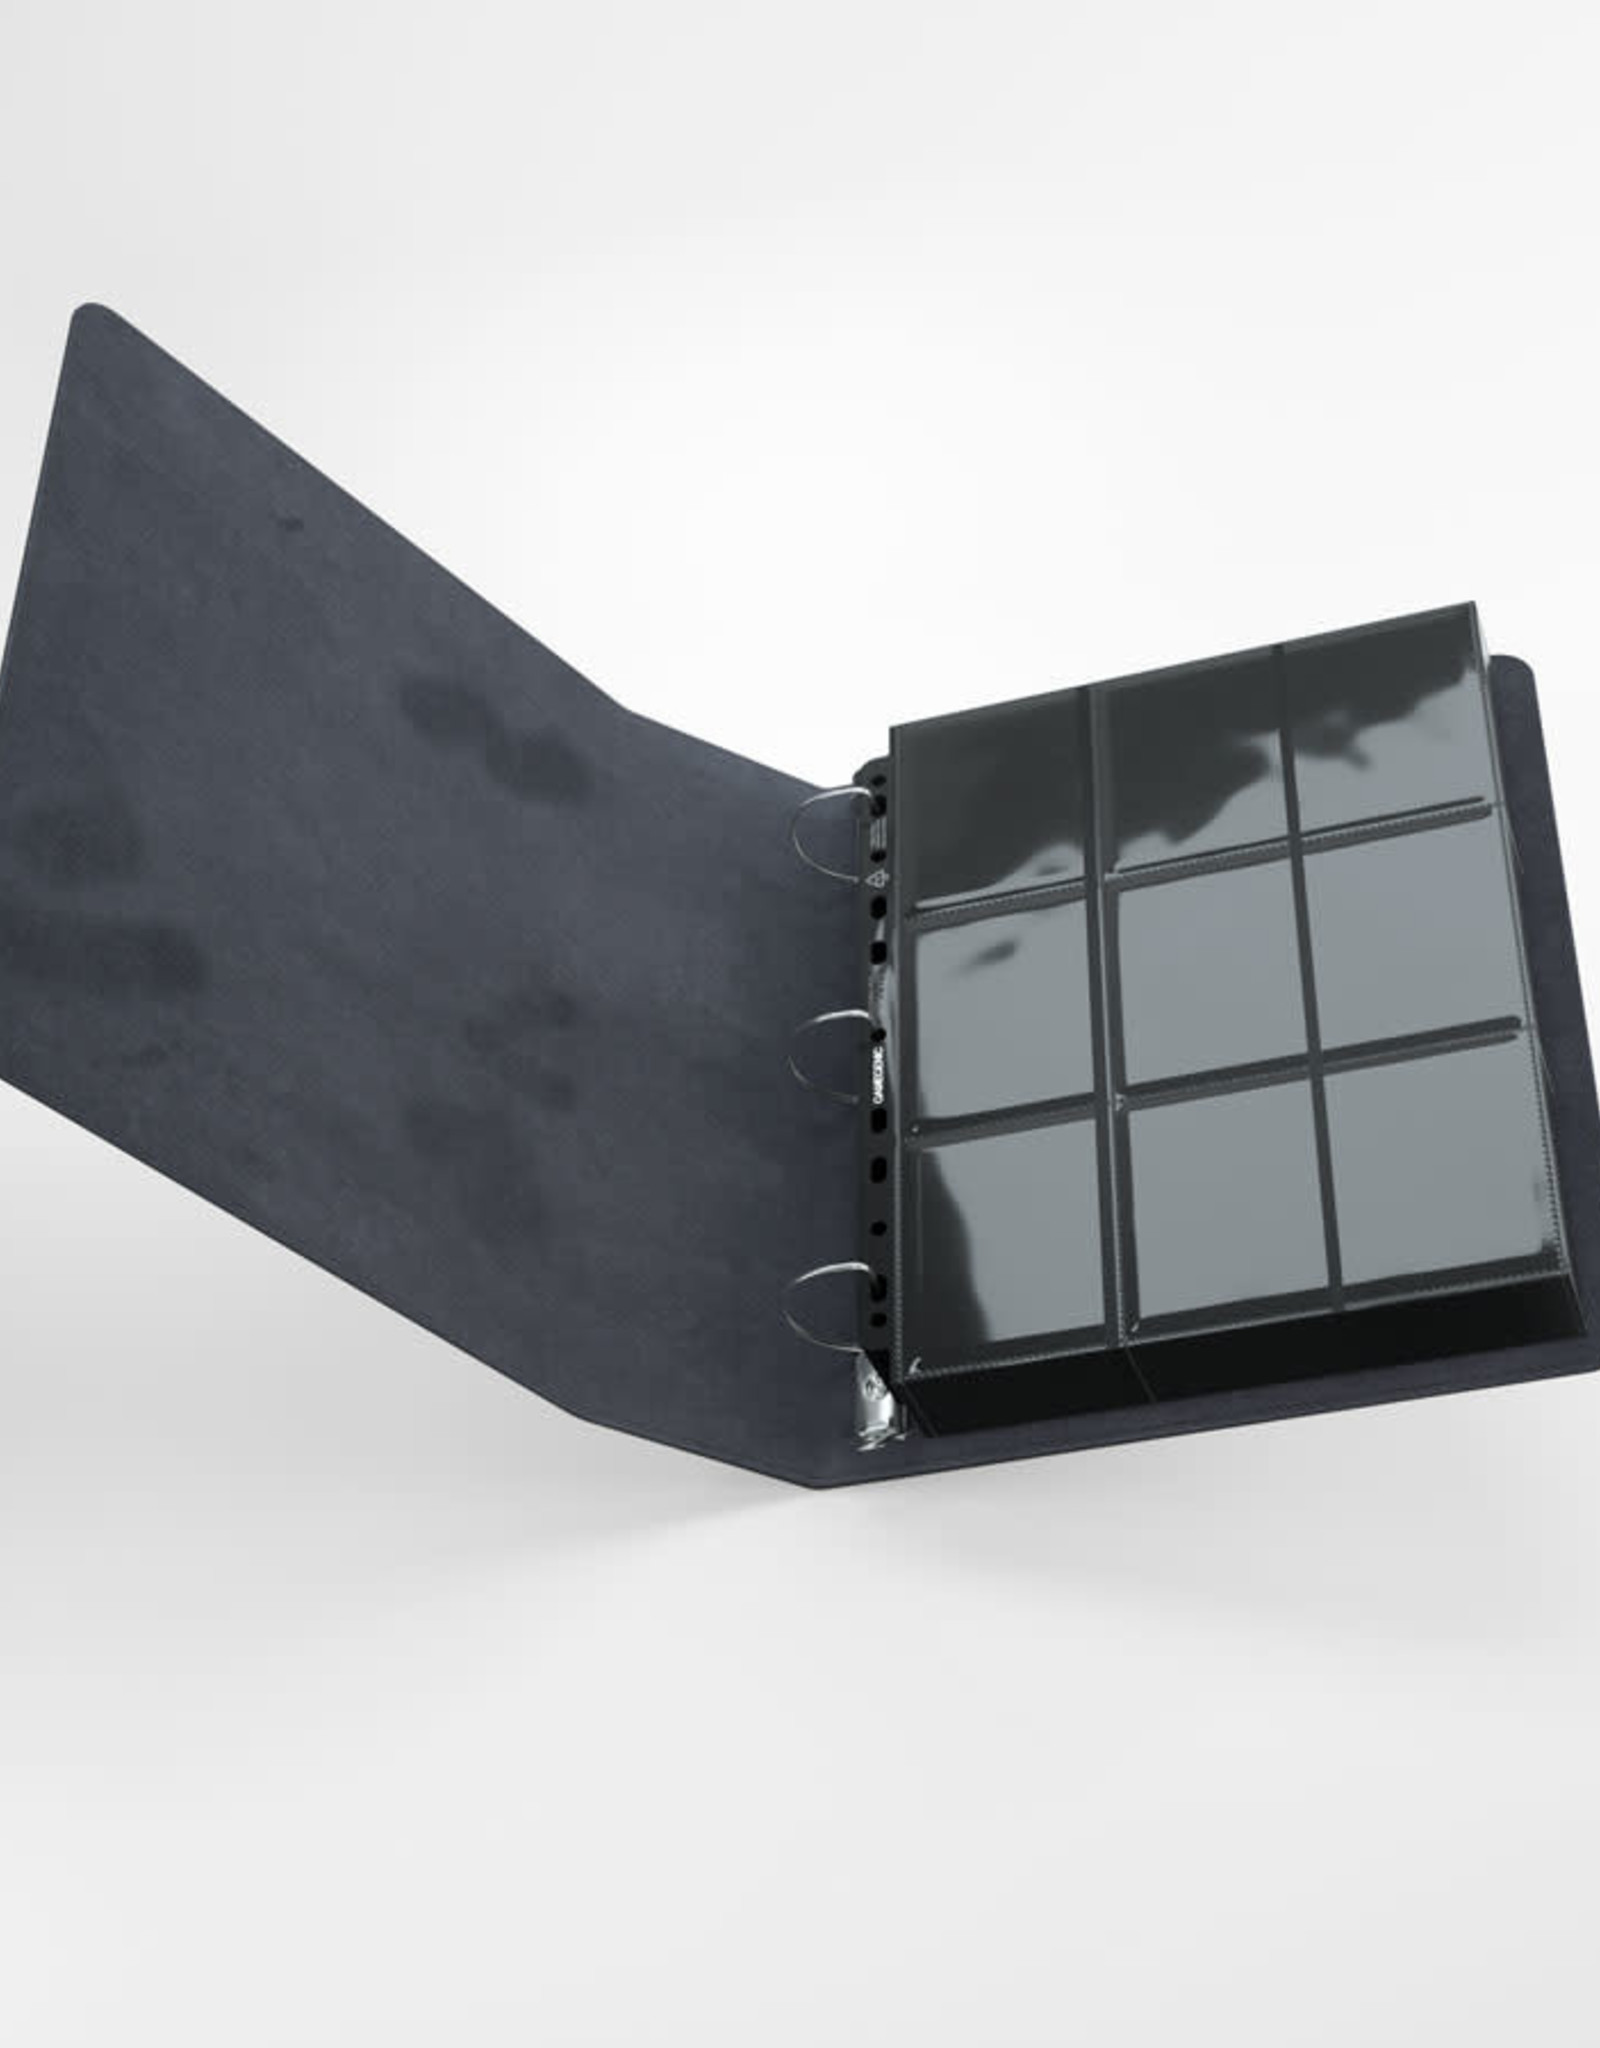 Prime Ring-Binder Black